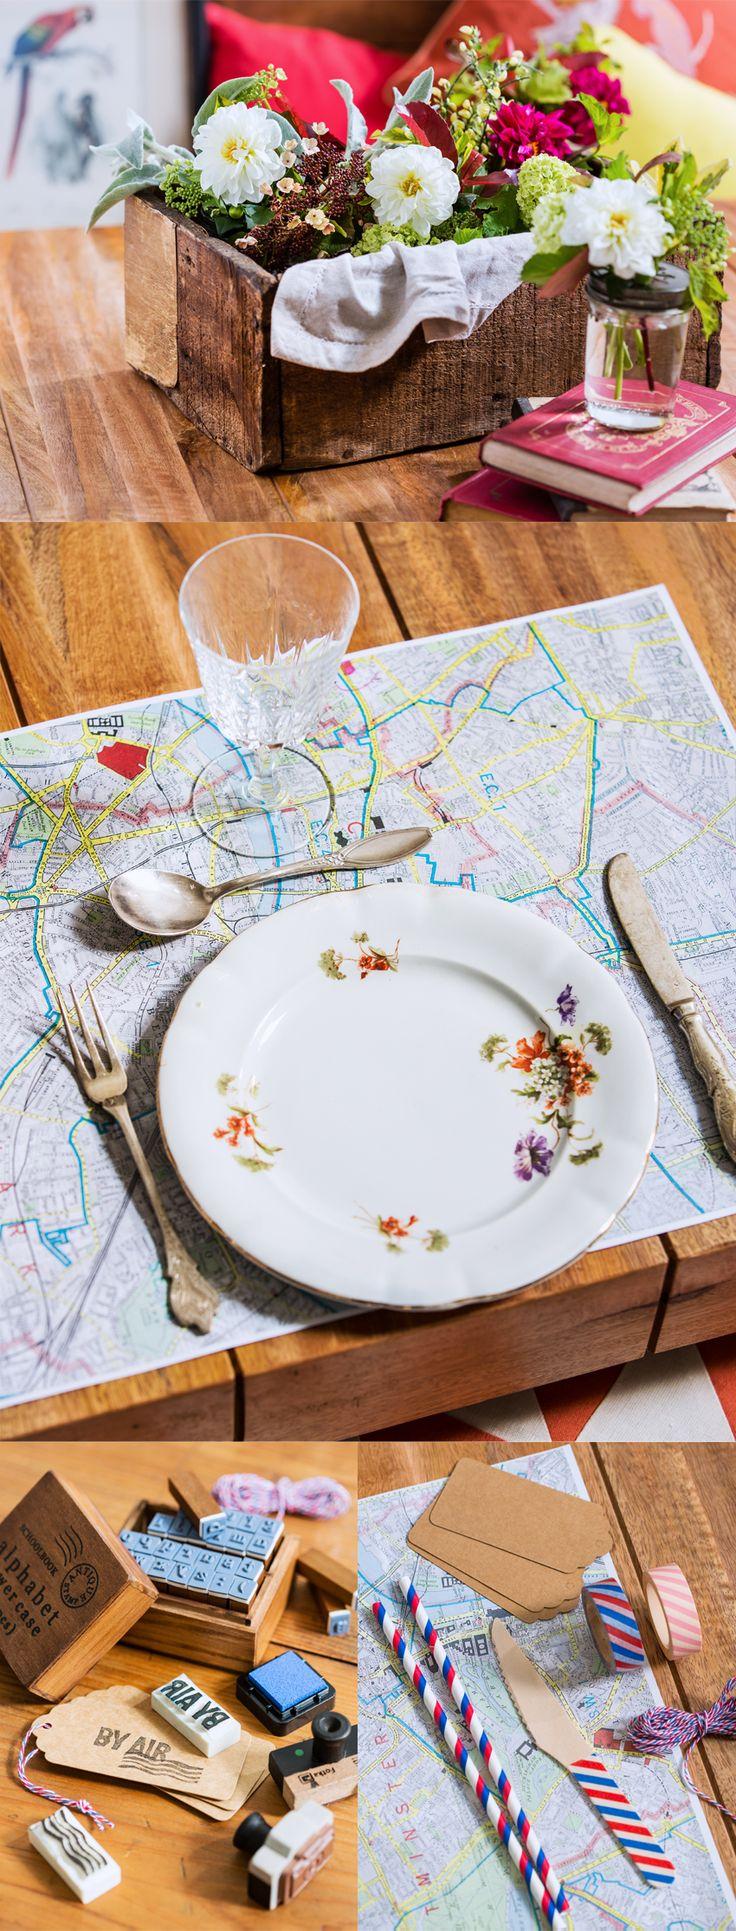 Travel Themed Table Decorations Diy Diy Pinterest